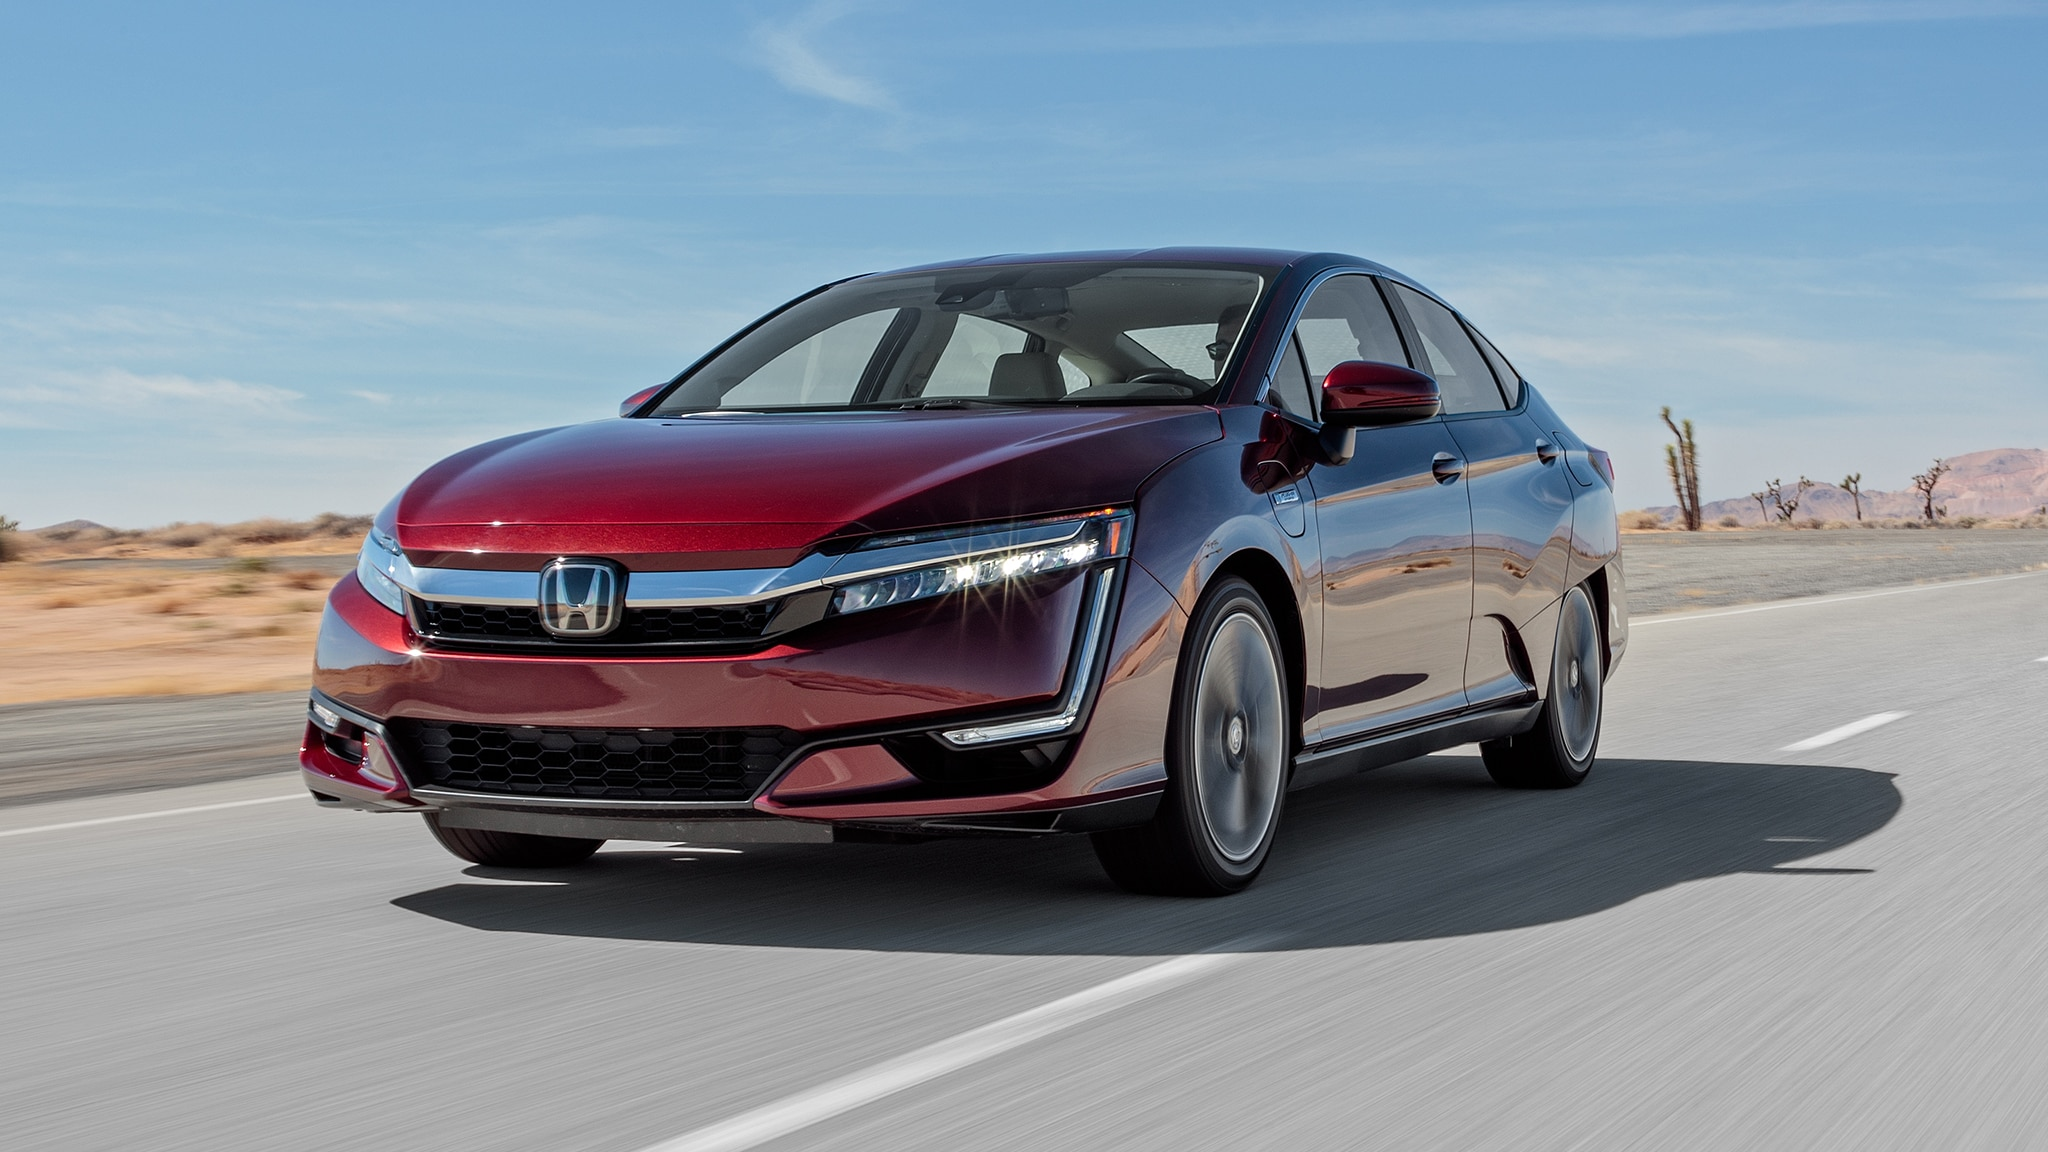 2018 Honda Clarity Front Three Quarter In Motion